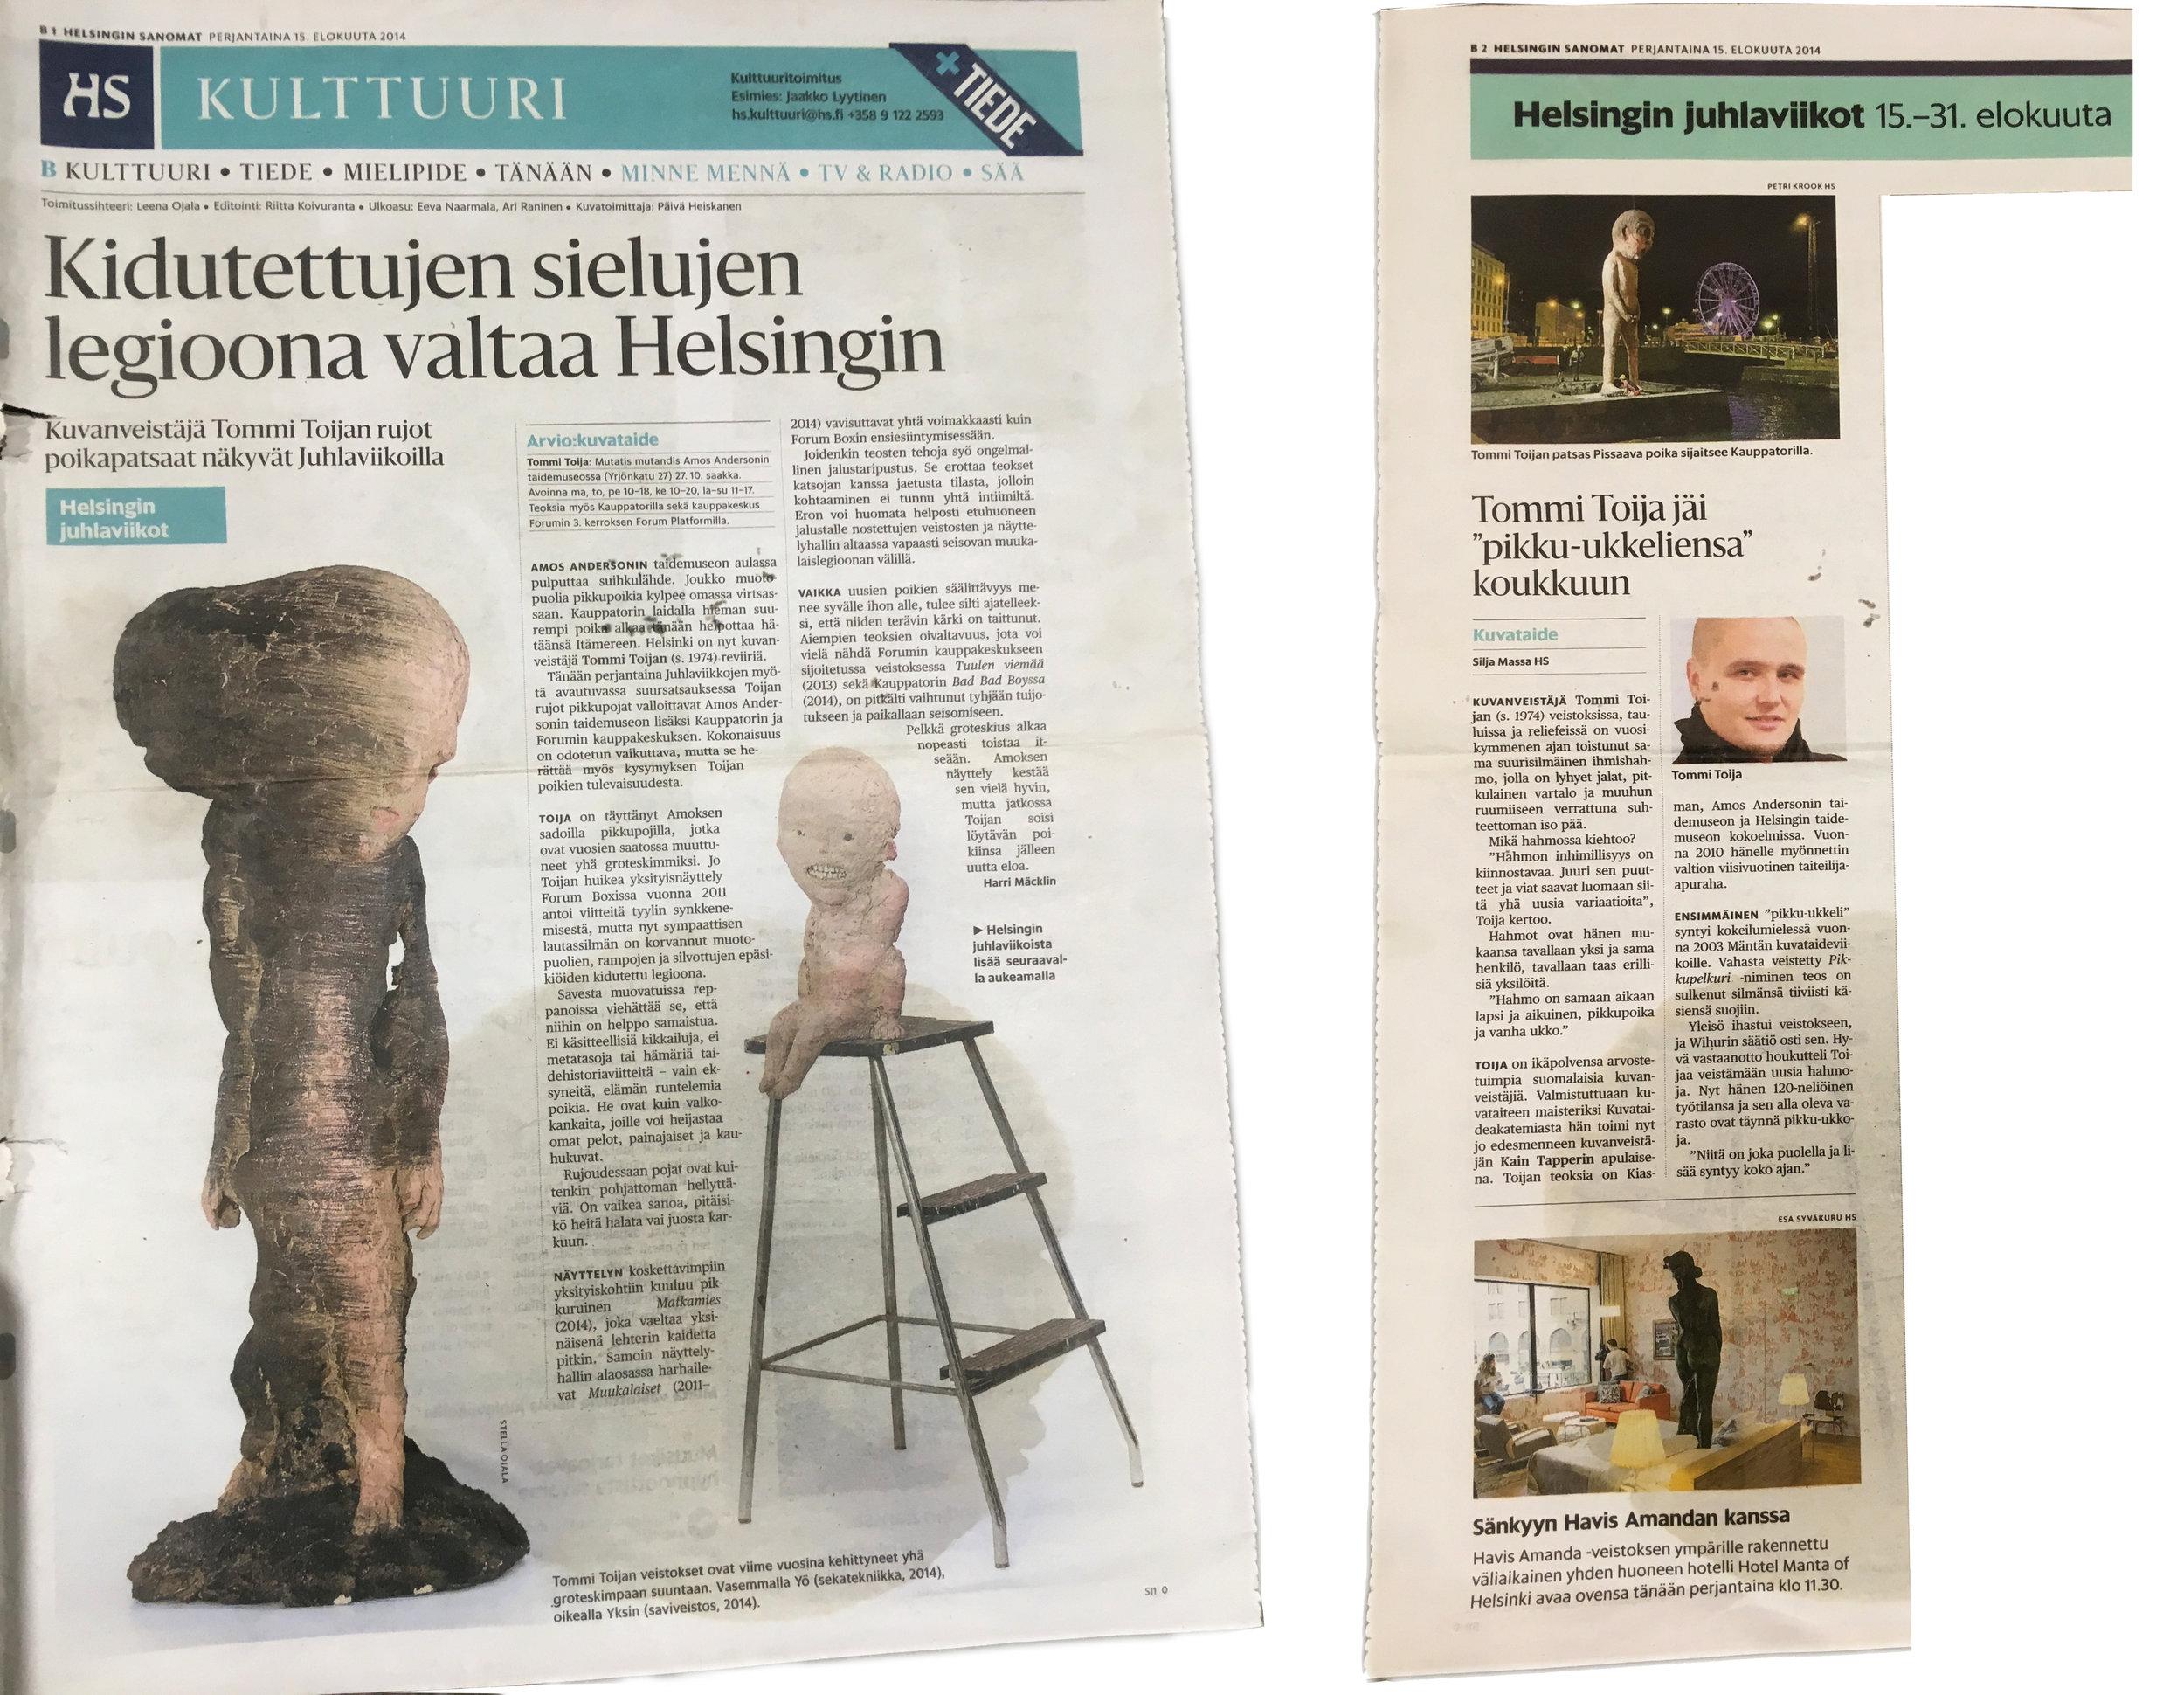 HELSINGIN SANOMAT15.8.2014 -